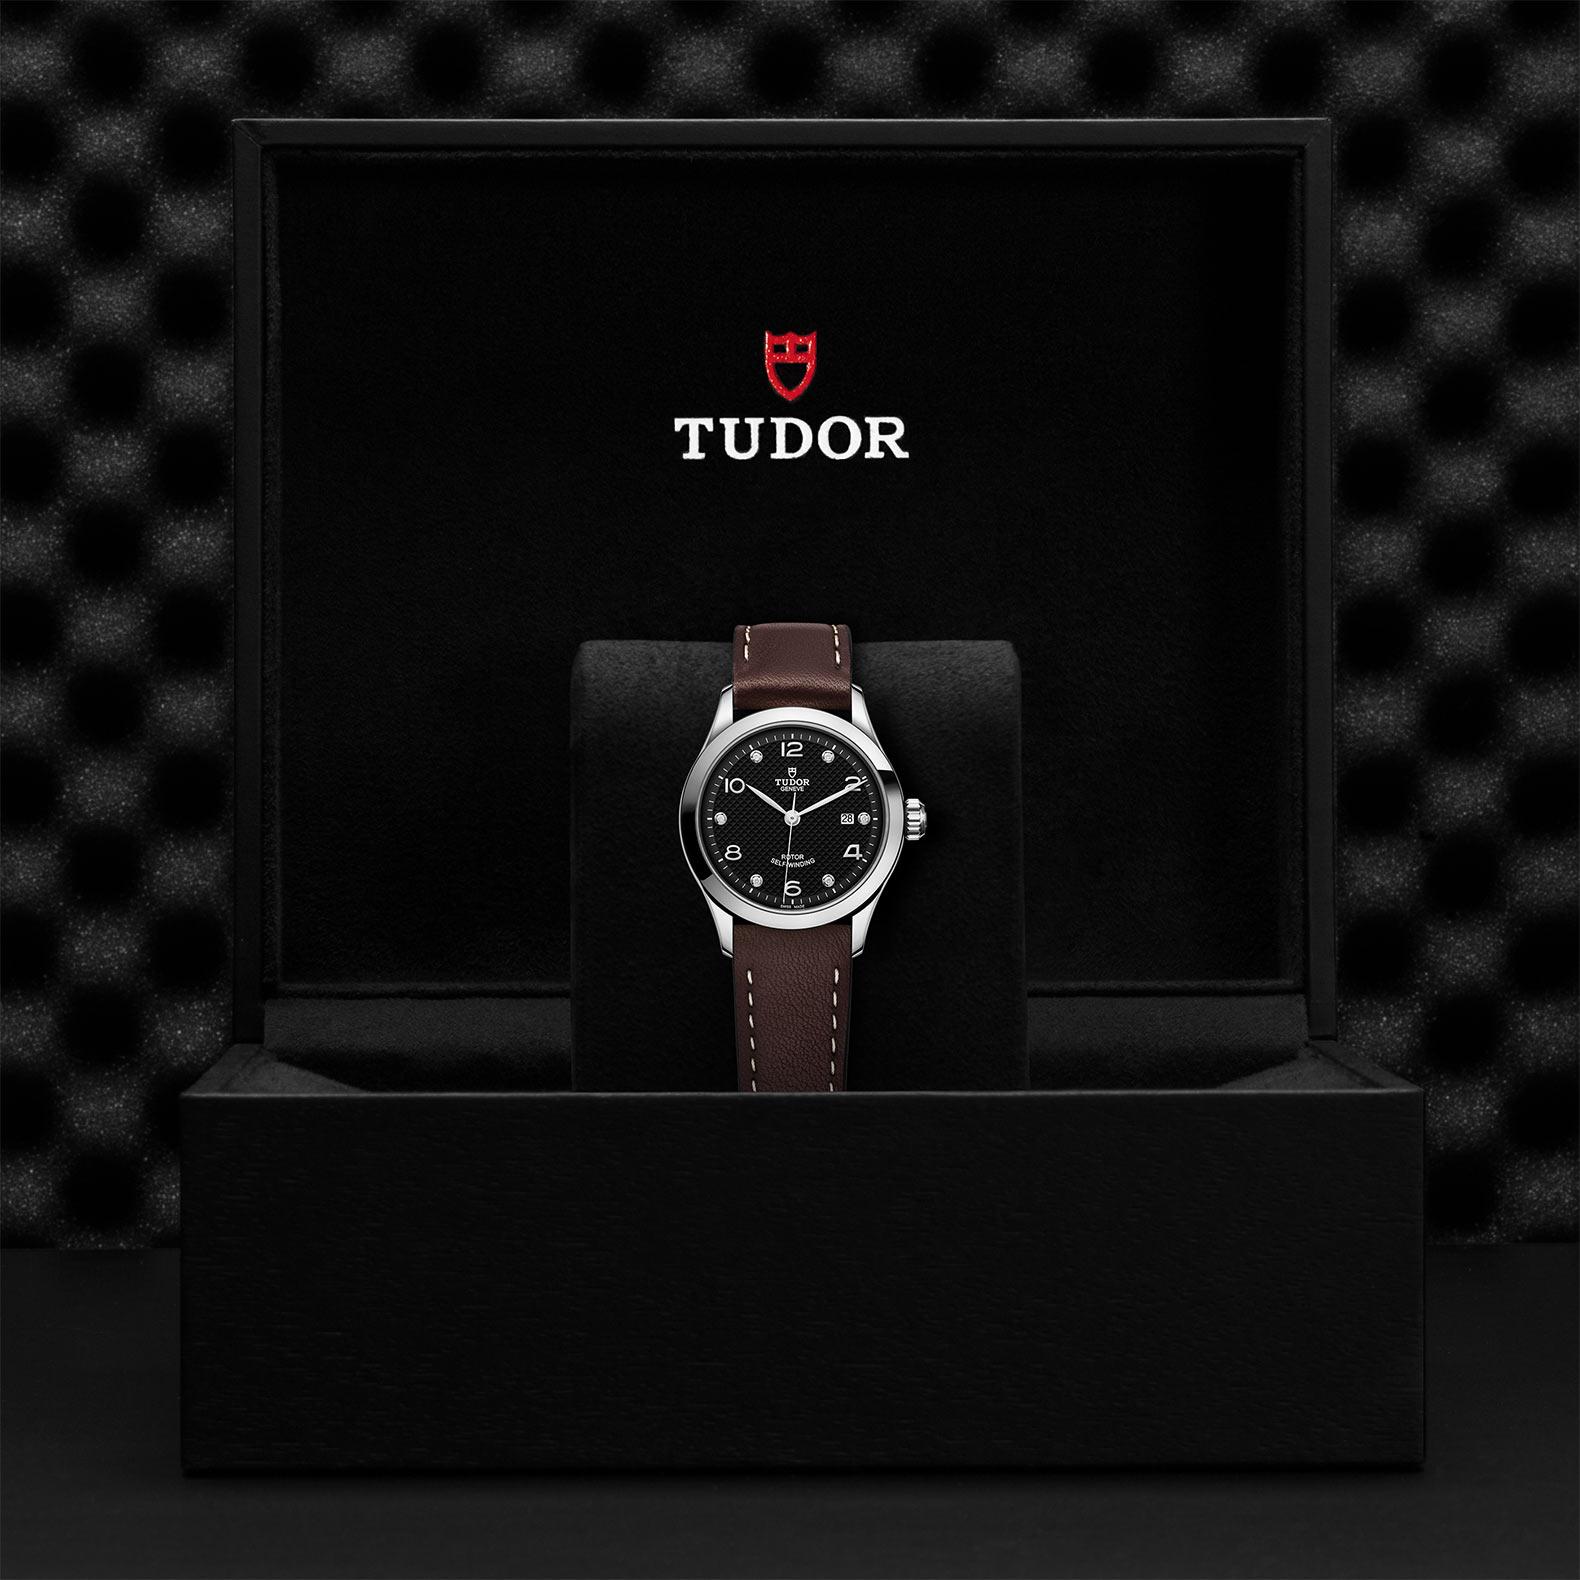 TUDOR 1926 - M91350-0009